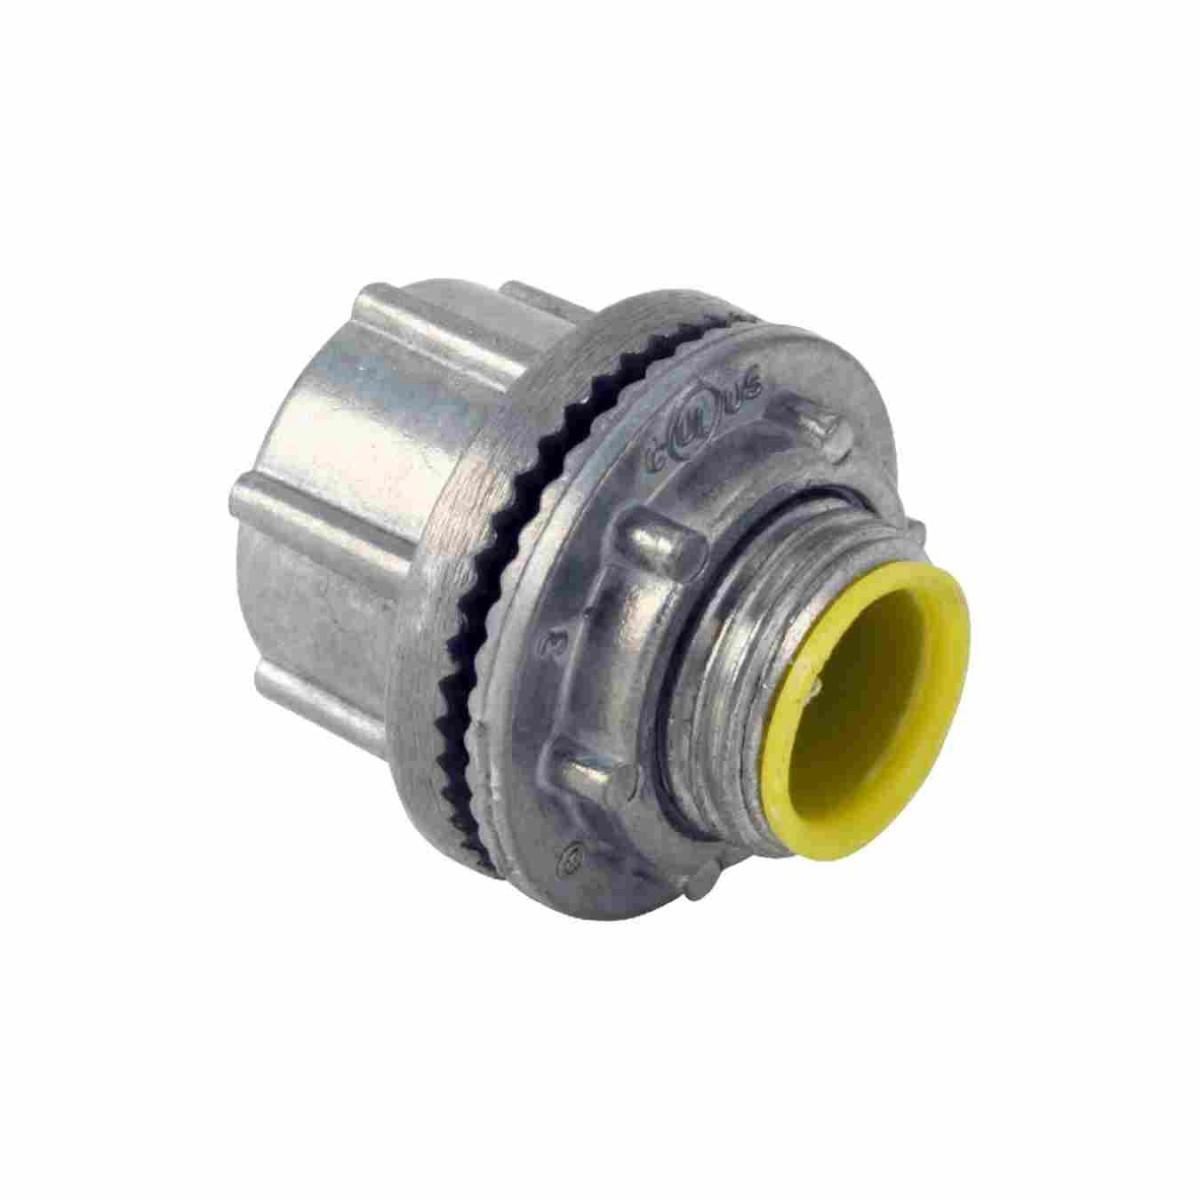 Watertight Hubs Rigid Fittings Electrical Fittings